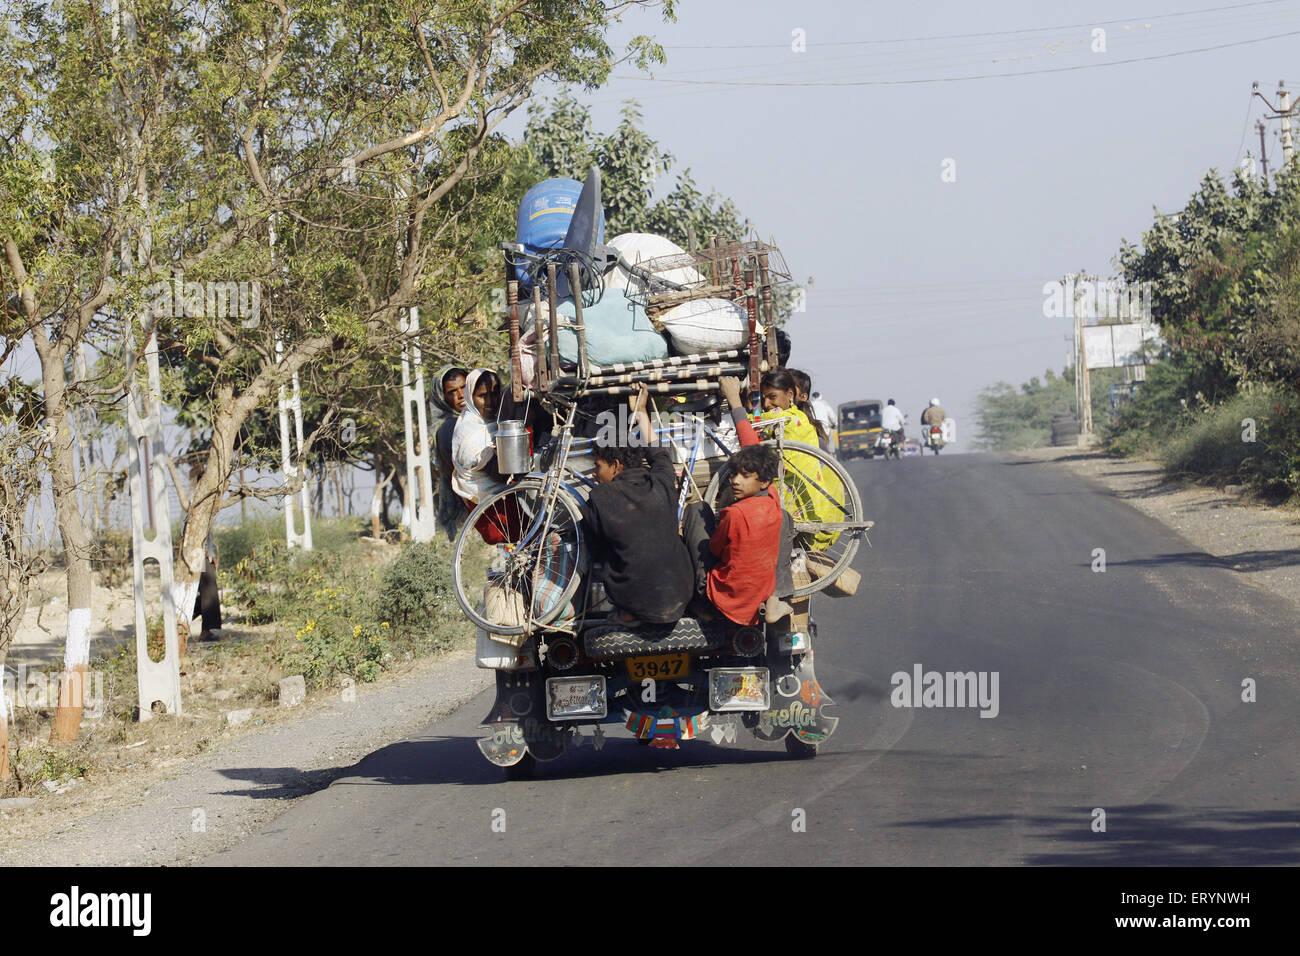 I residenti locali viaggi in chakdo ; Porbandar ; Gujarat ; India NOMR Immagini Stock